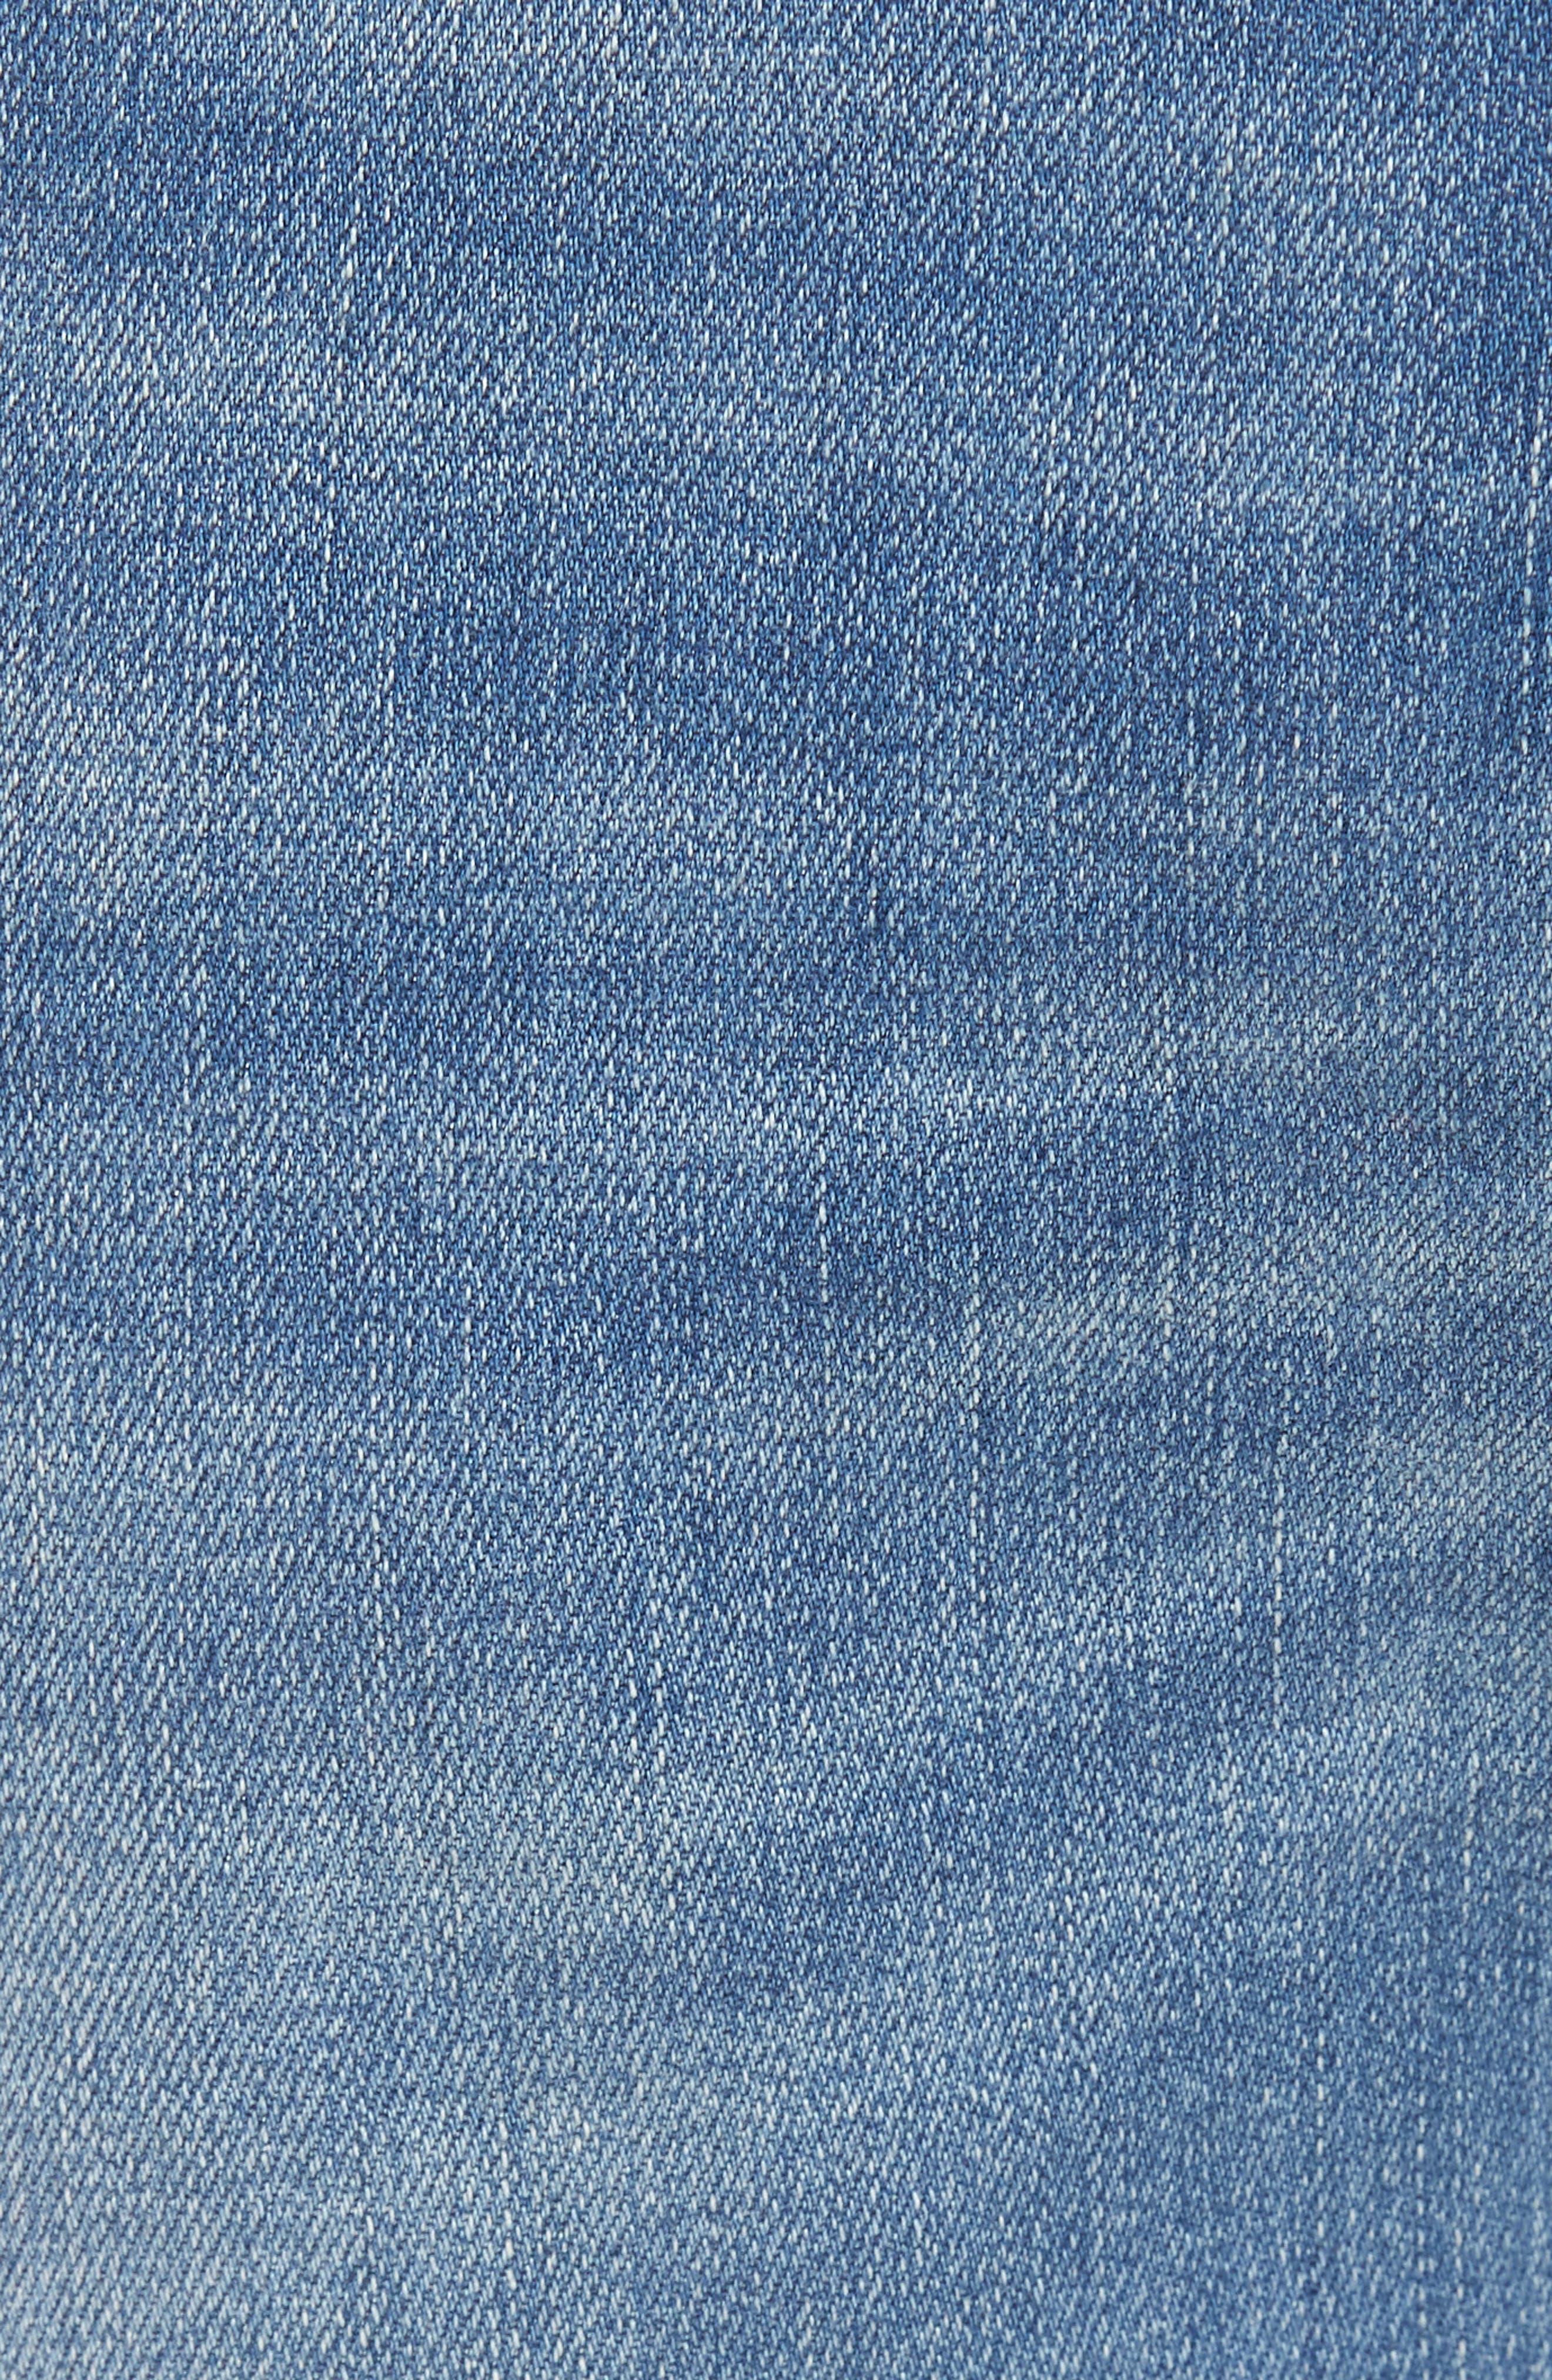 Wight Slim Fit Straight Leg Jeans,                             Alternate thumbnail 5, color,                             Atlantic Blue